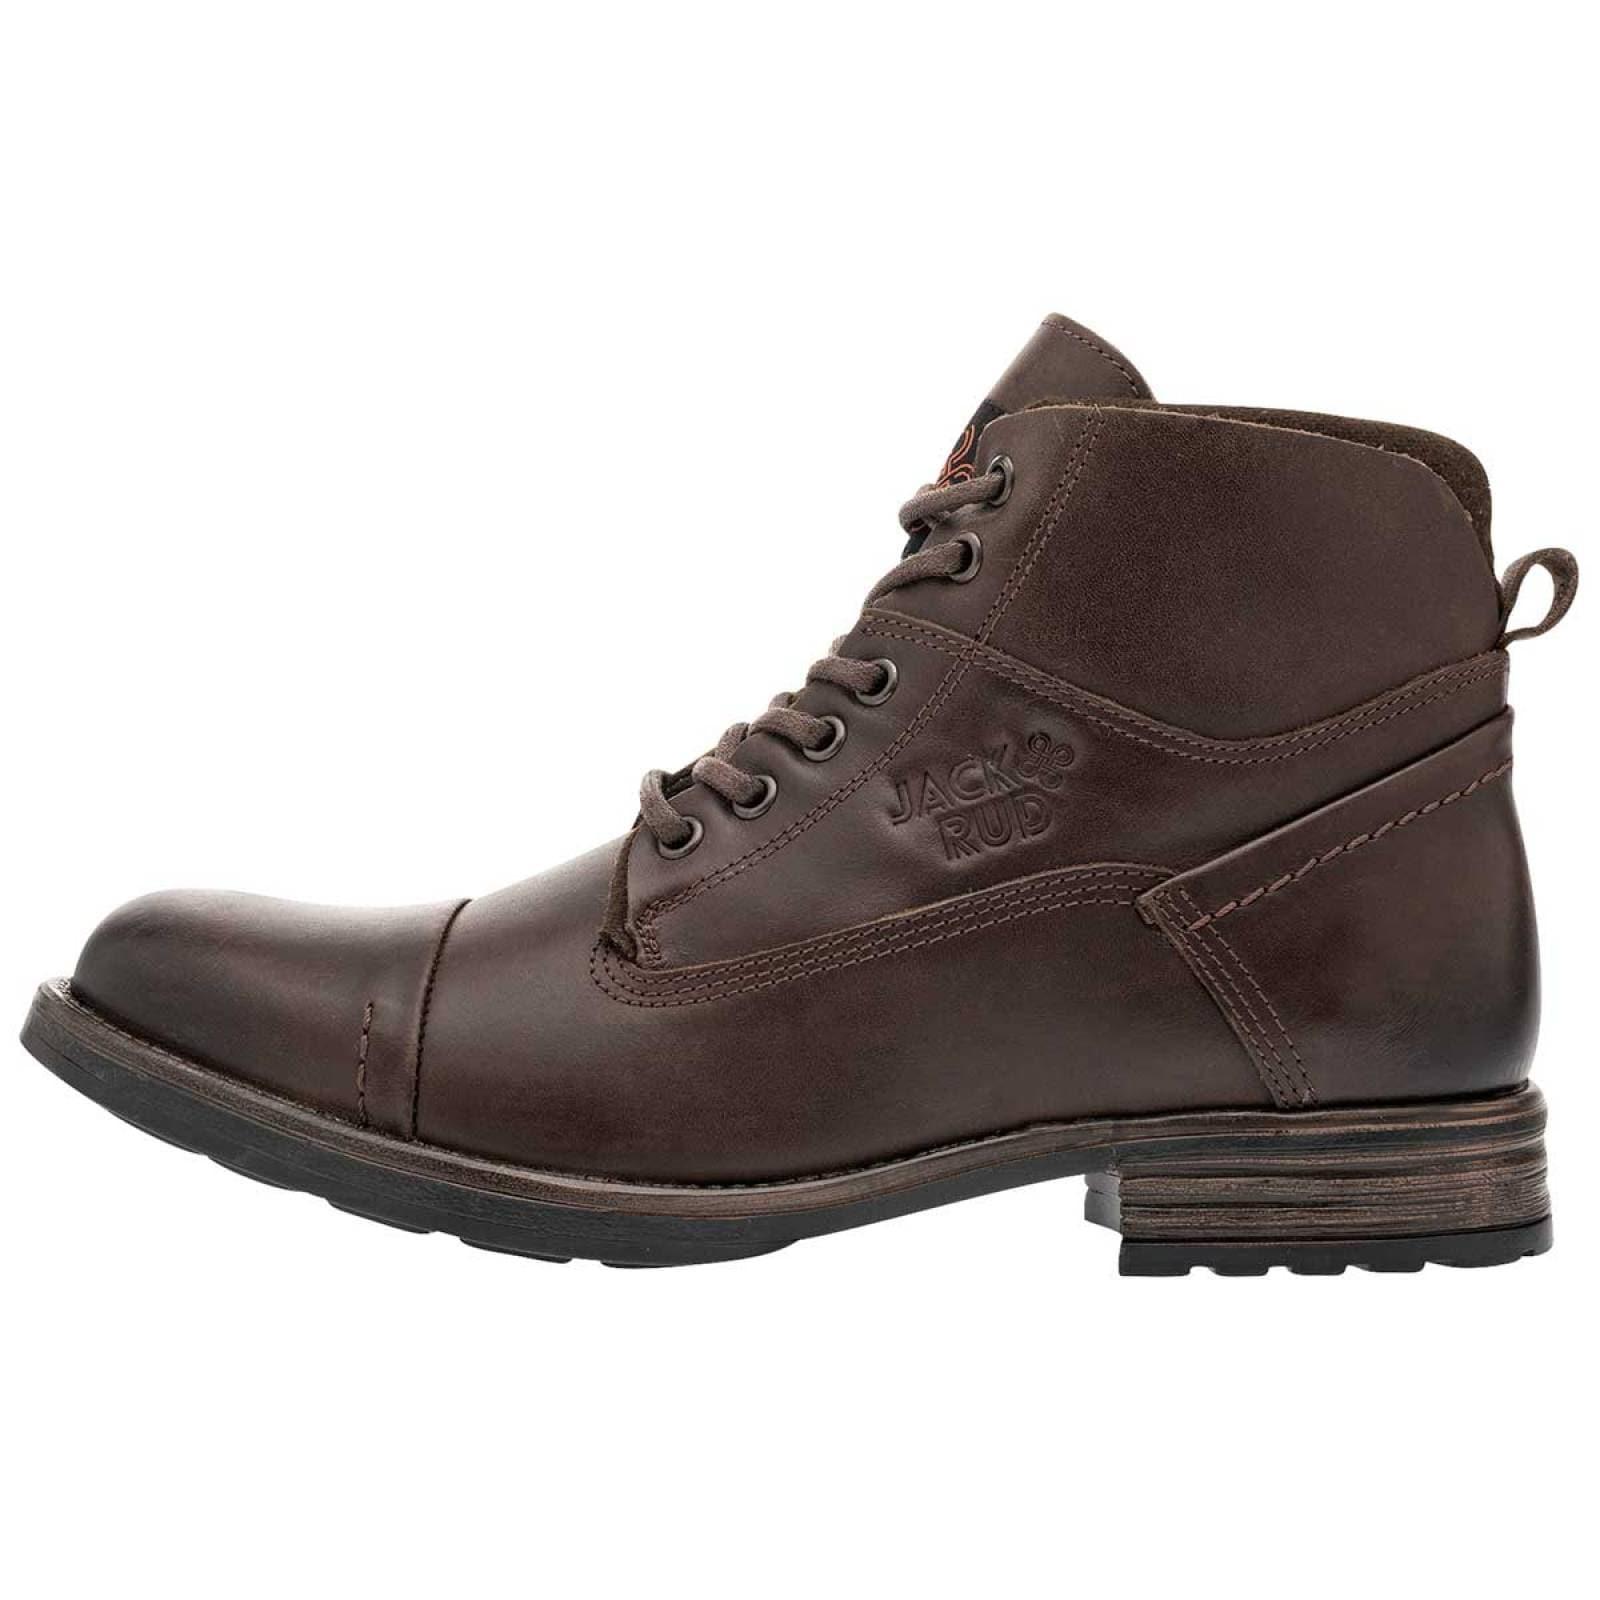 Jack rud shoe brand Bota y botin Hombre Cafe